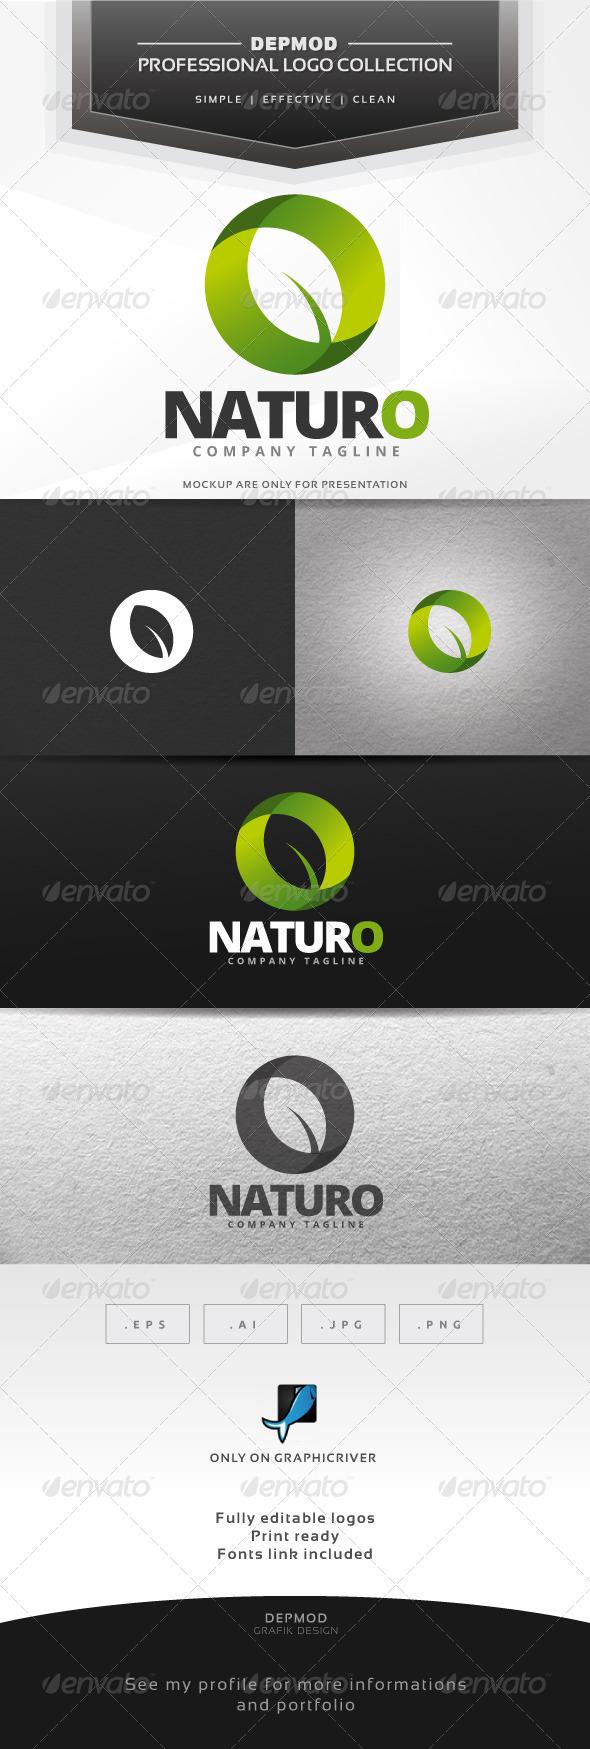 GraphicRiver Naturo Logo 7314486